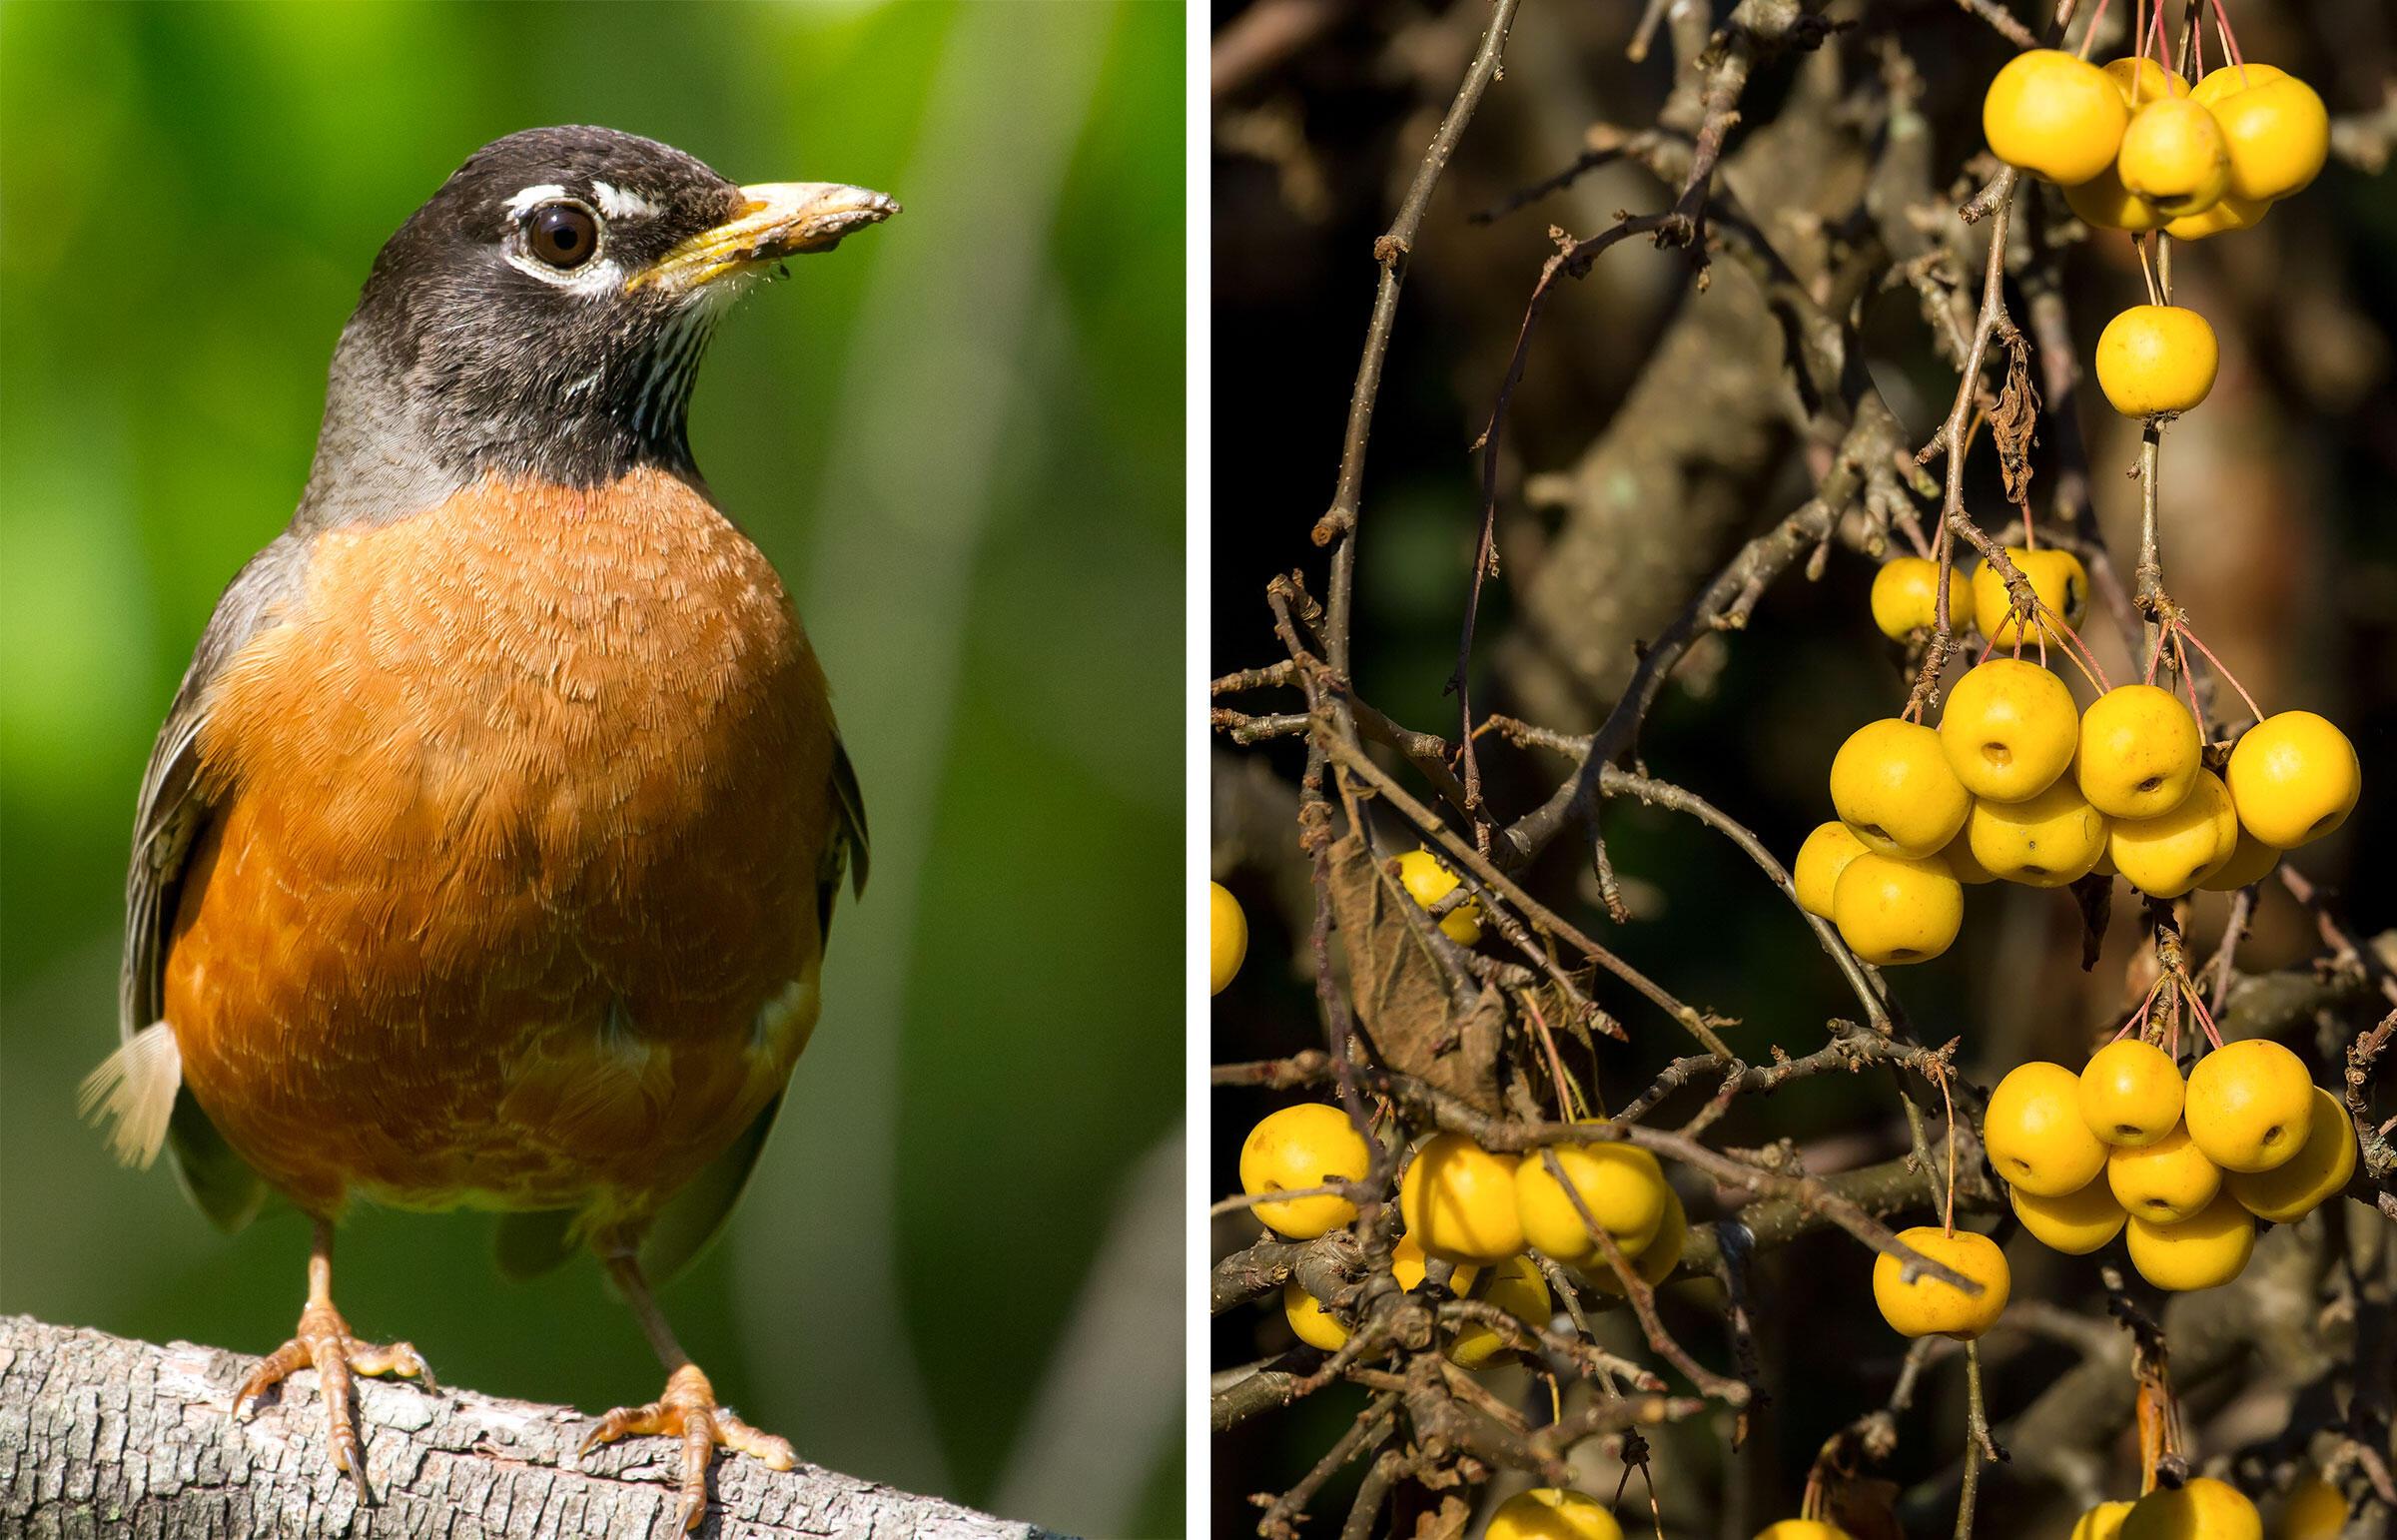 From left: American Robin. Photo: Frode Jacobsen; Crab apple. Photo: artush/Adobe Stock